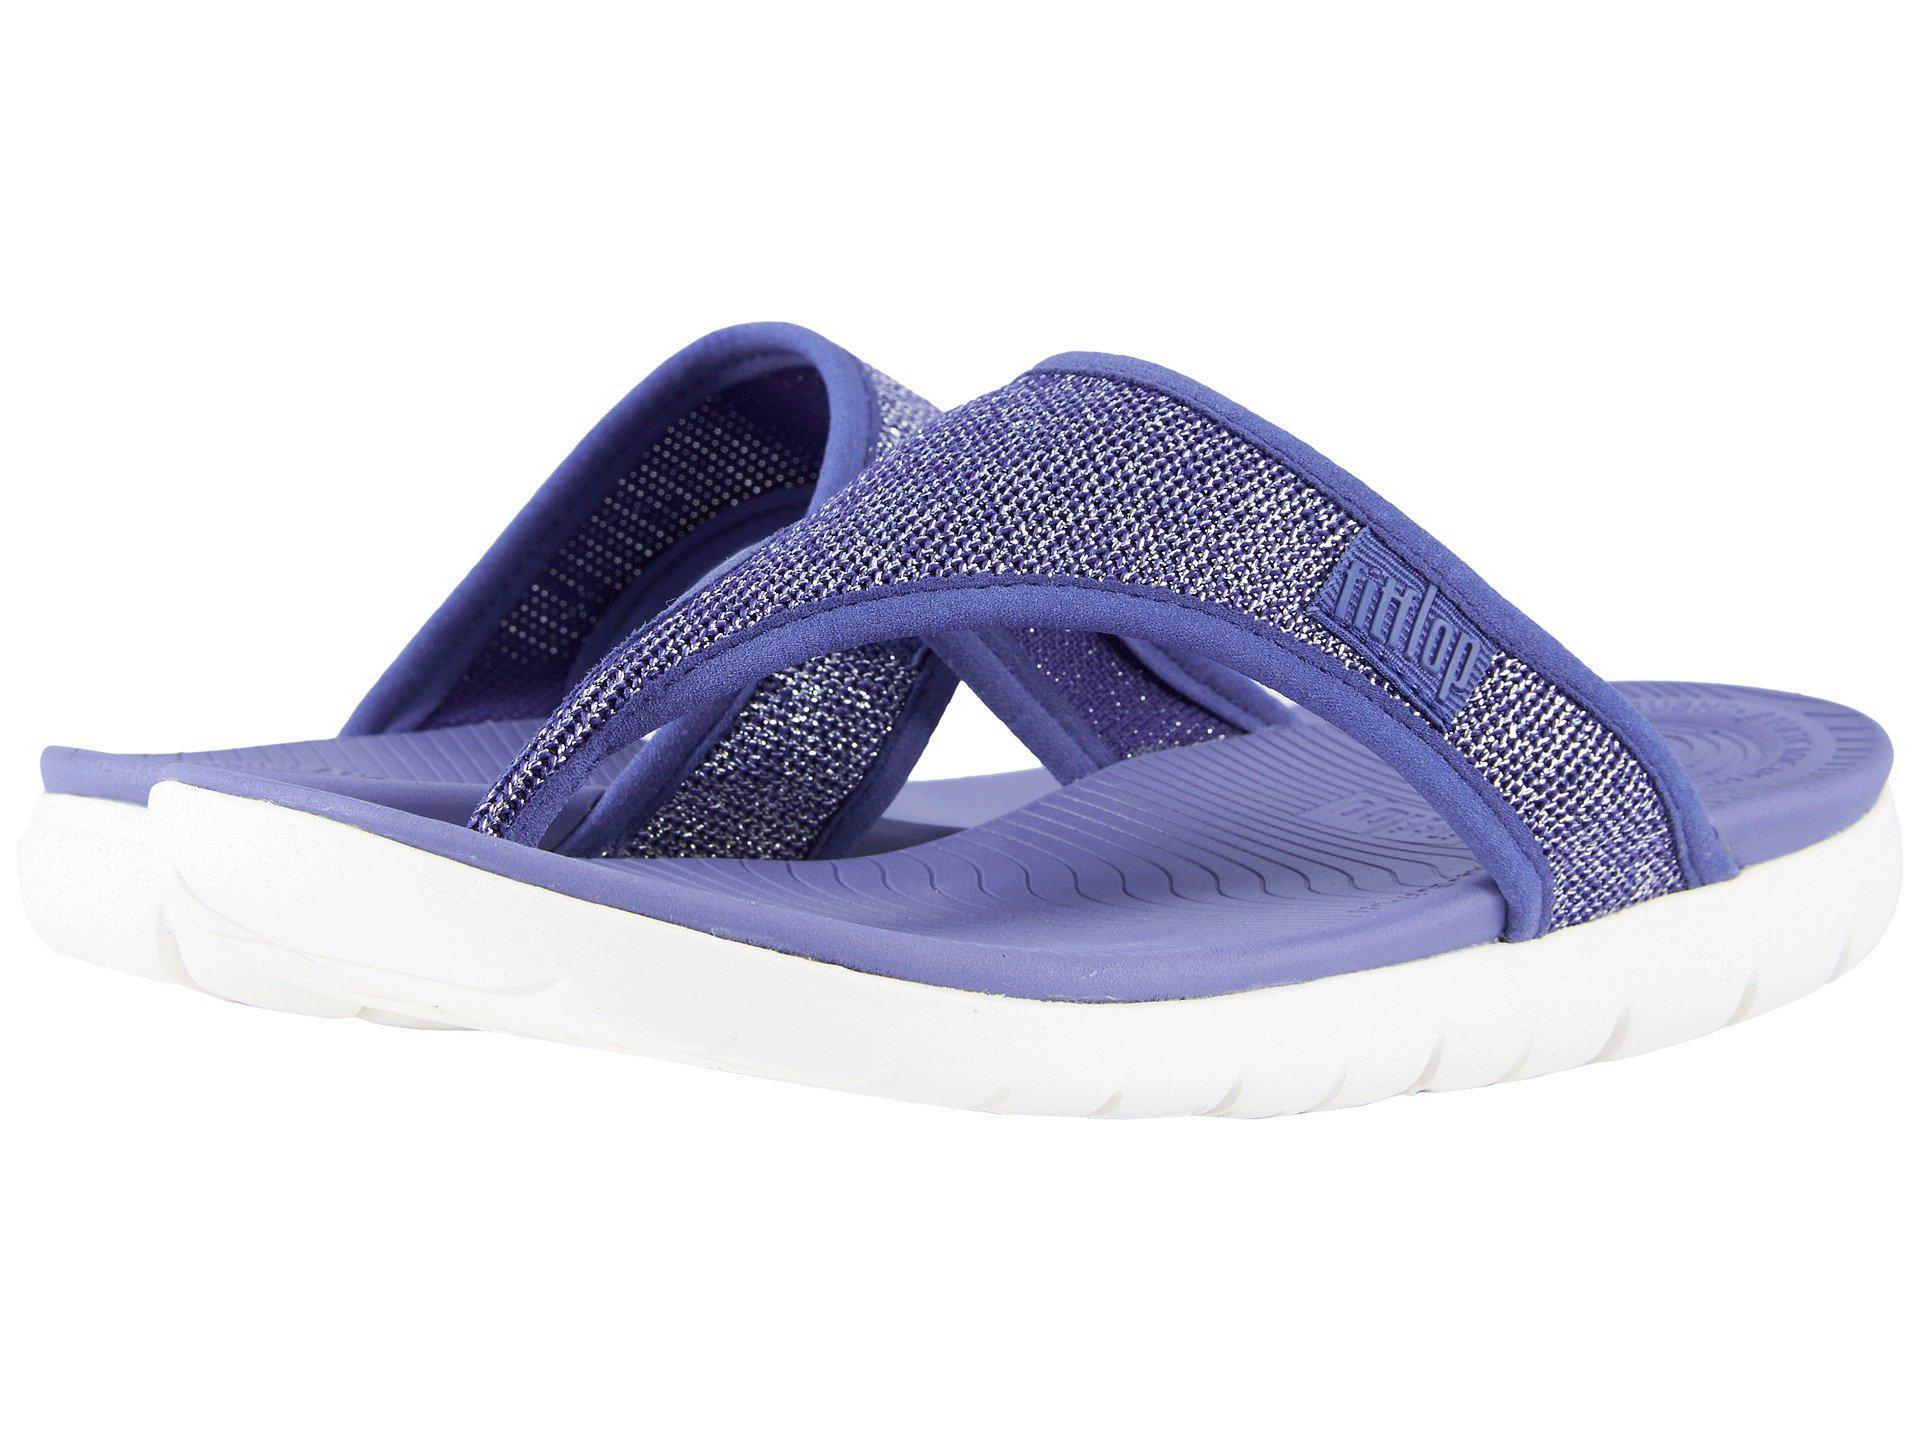 FitFlop Uberknit Toe Thong Sandals 63aTryKAa6